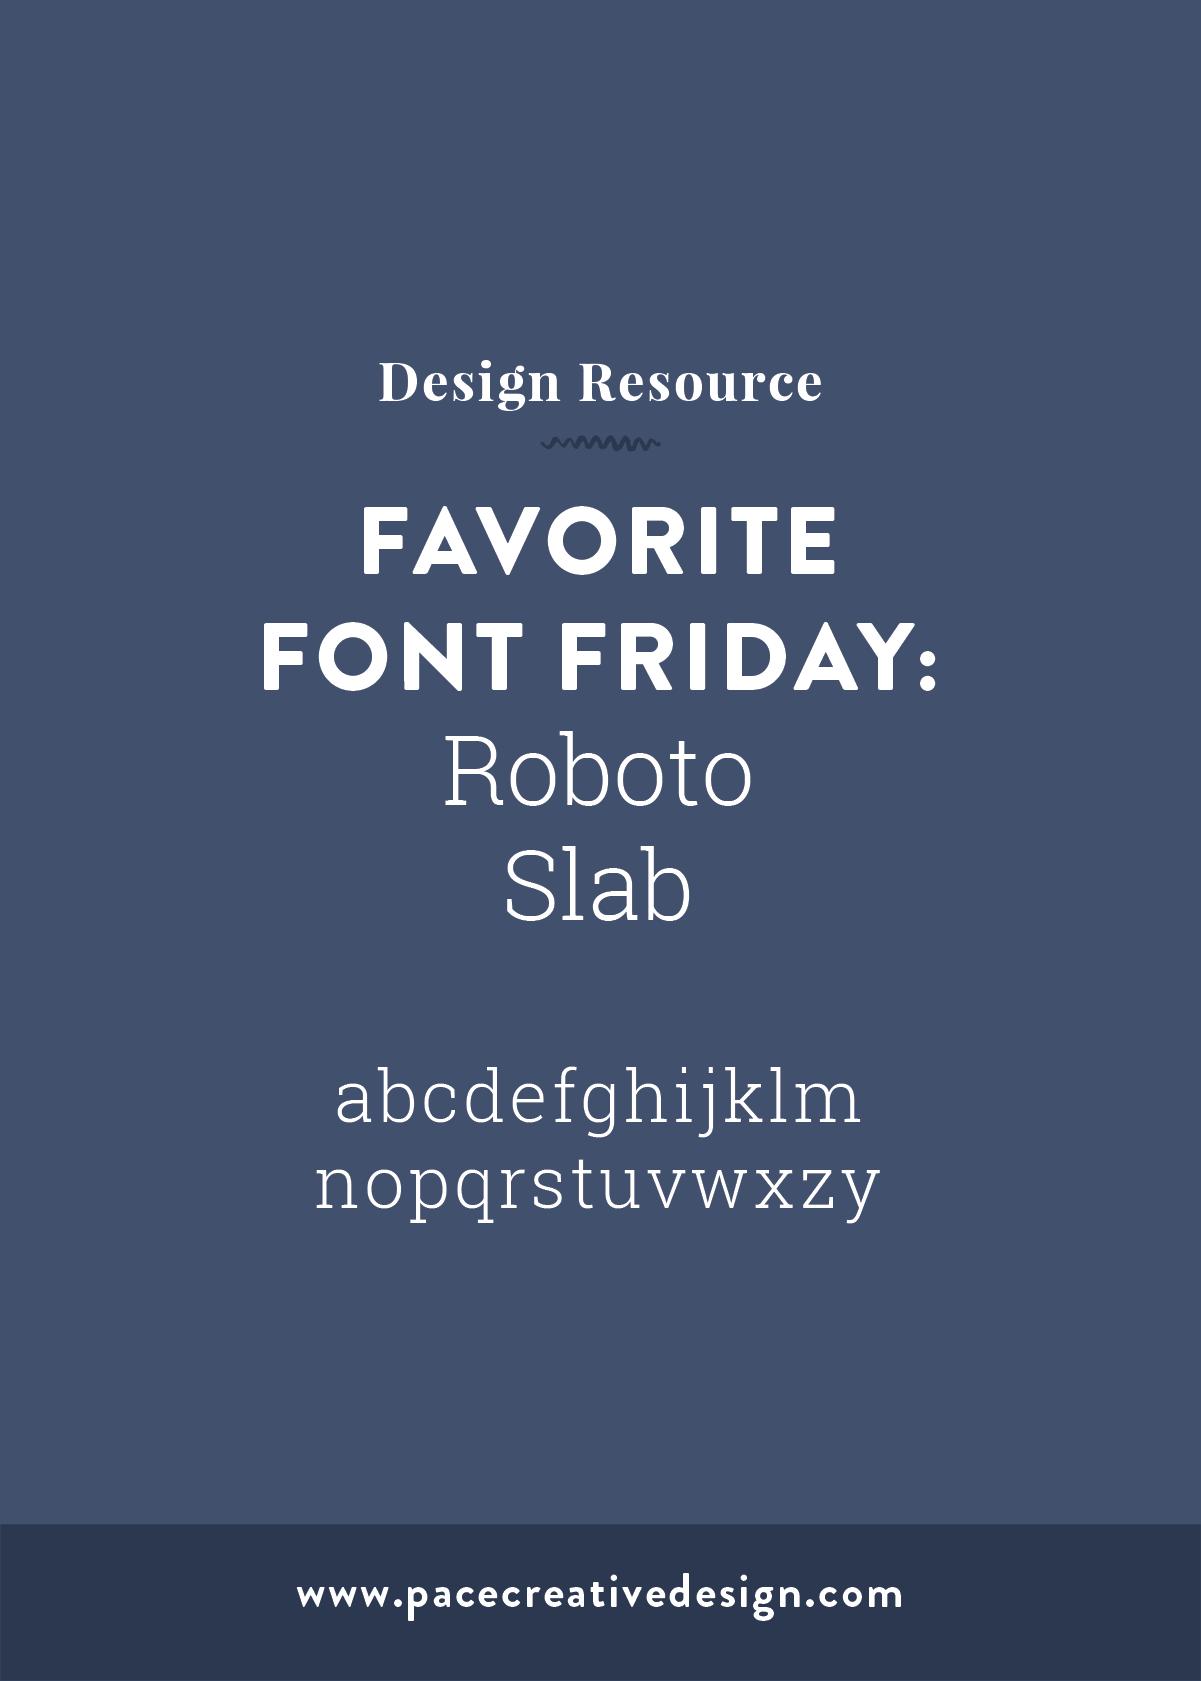 Favorite Font Friday No. 2 – Roboto Slab | Pace Creative Design Studio